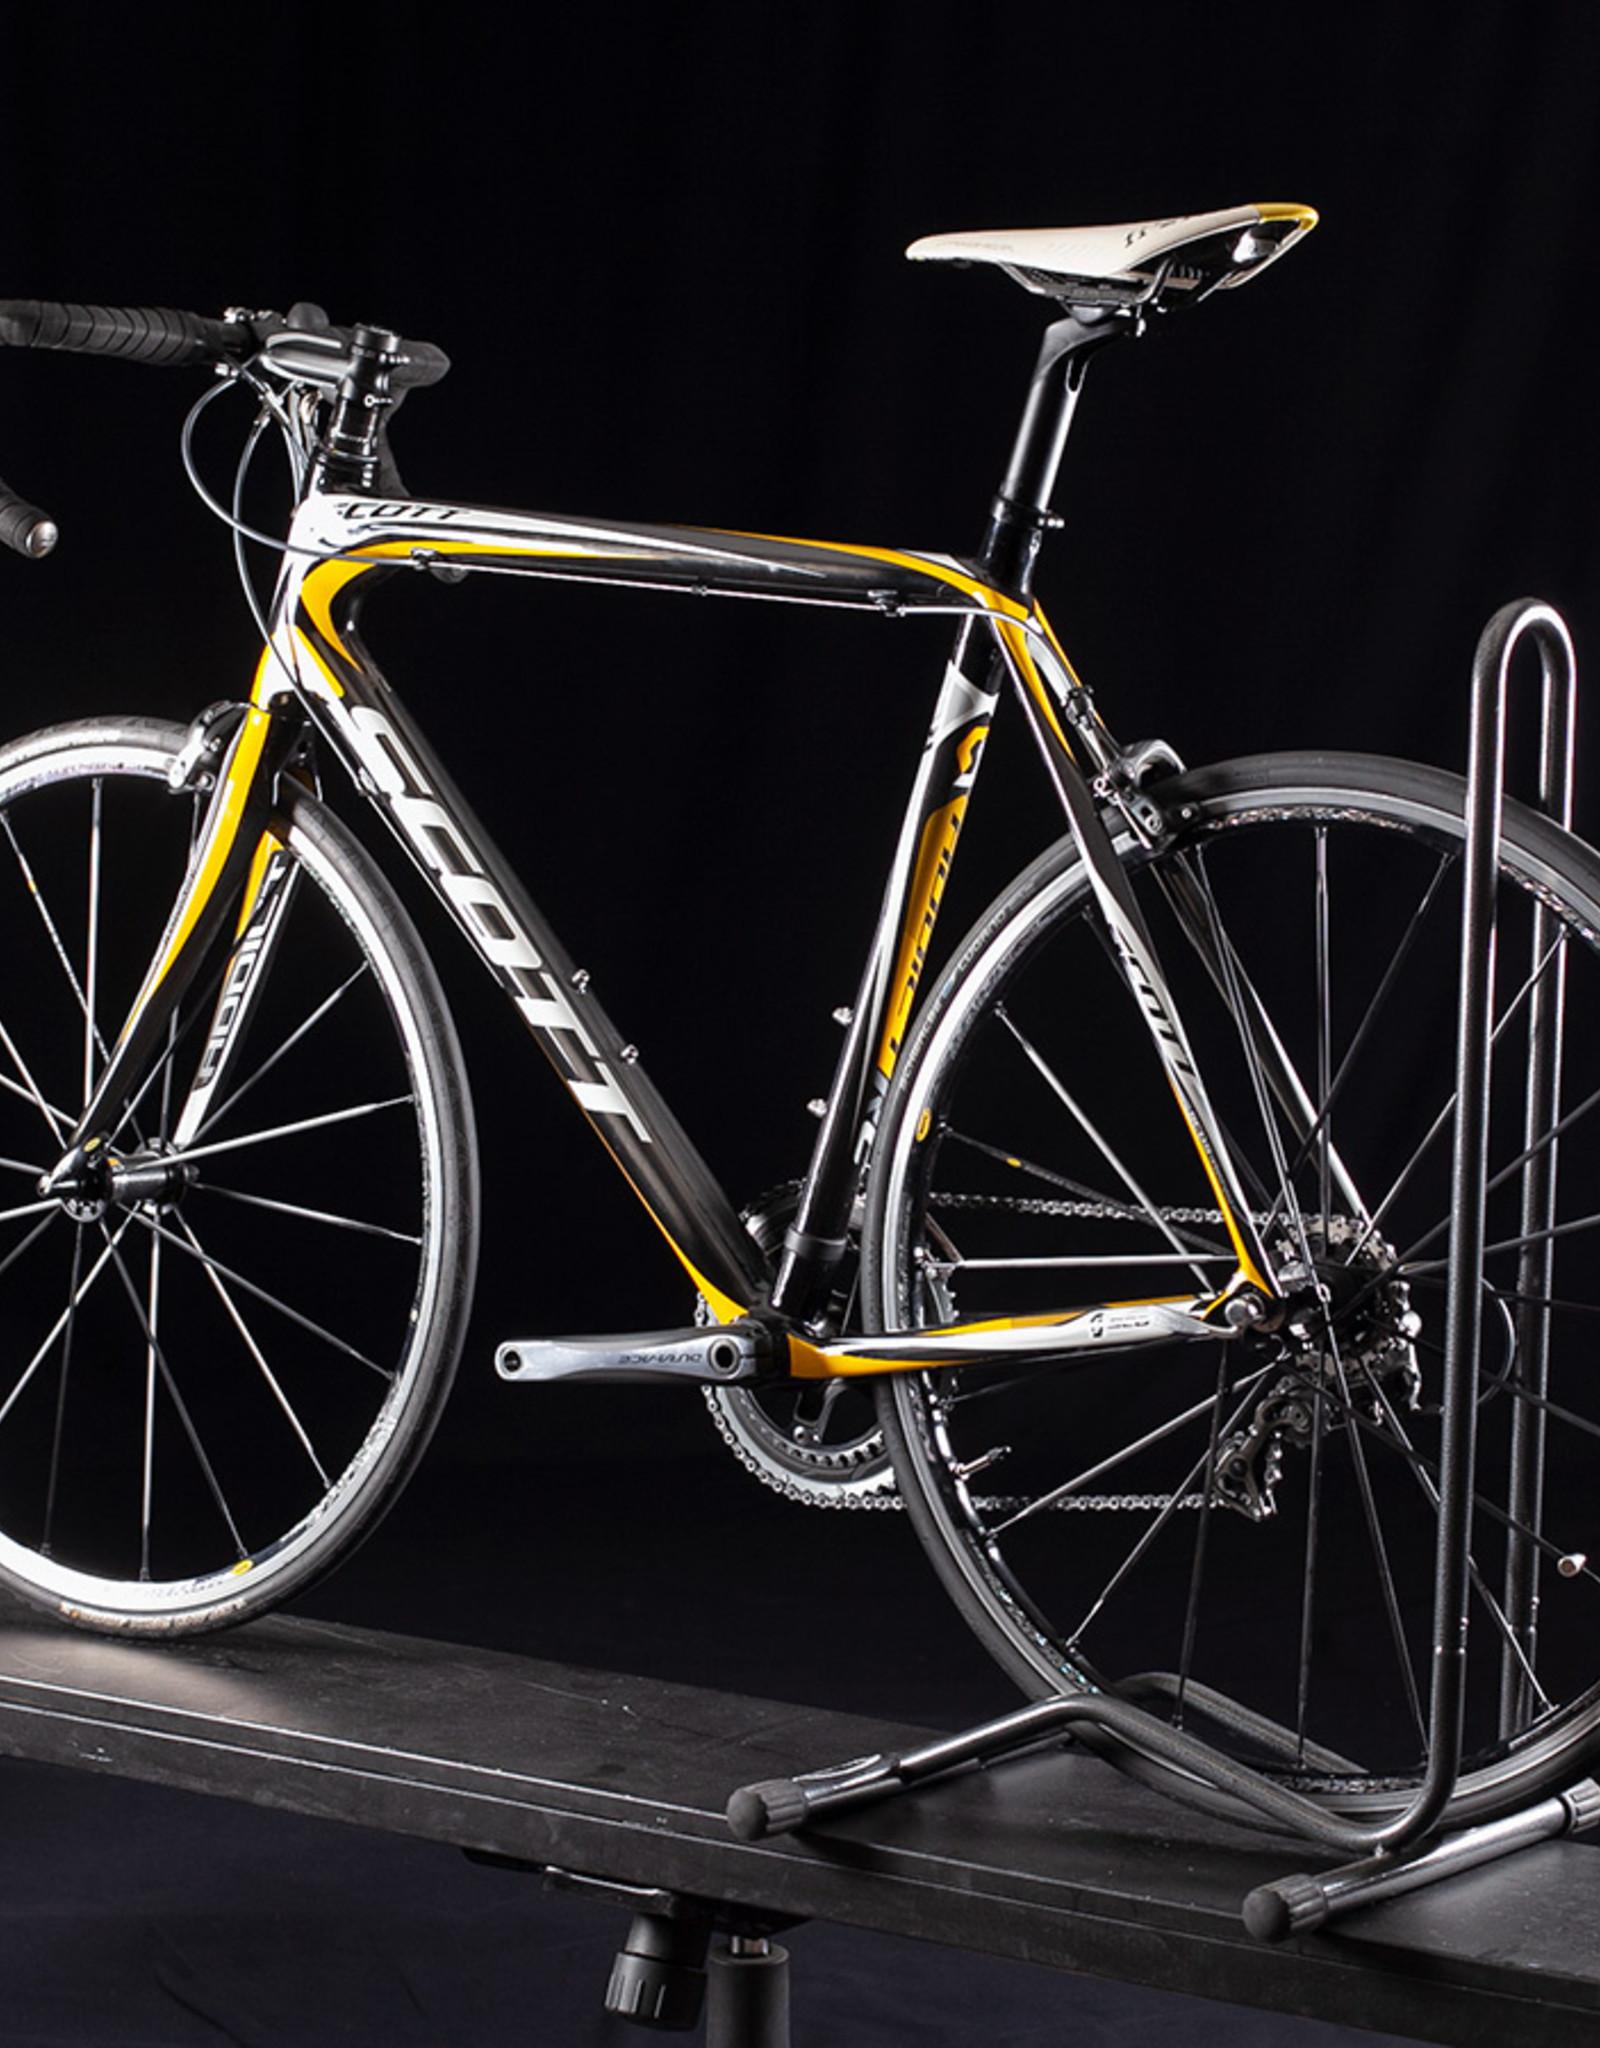 2011 Scott Addict RC carbon road bike, Dura Ace 7900, Mavic wheels, Size 58 Nice!